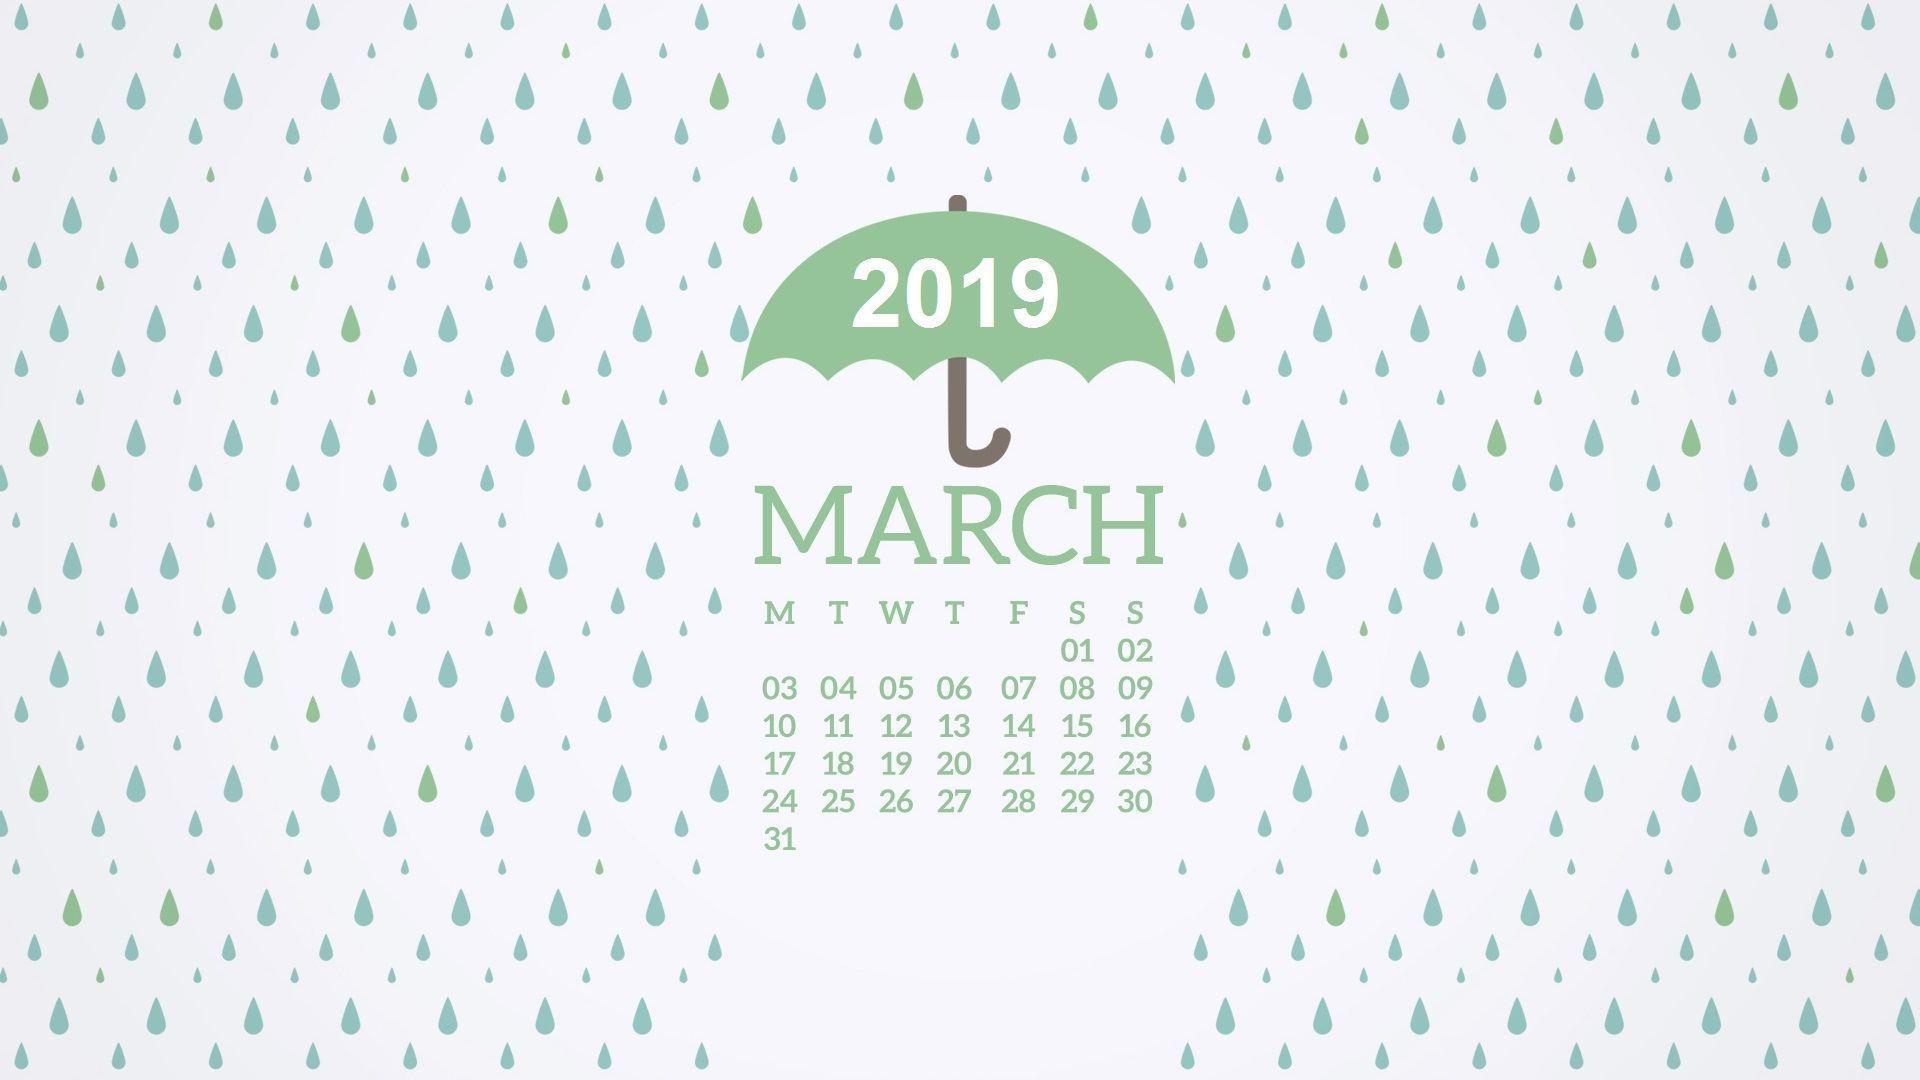 March 2019 Calendar Wallpapers - Wallpaper Cave